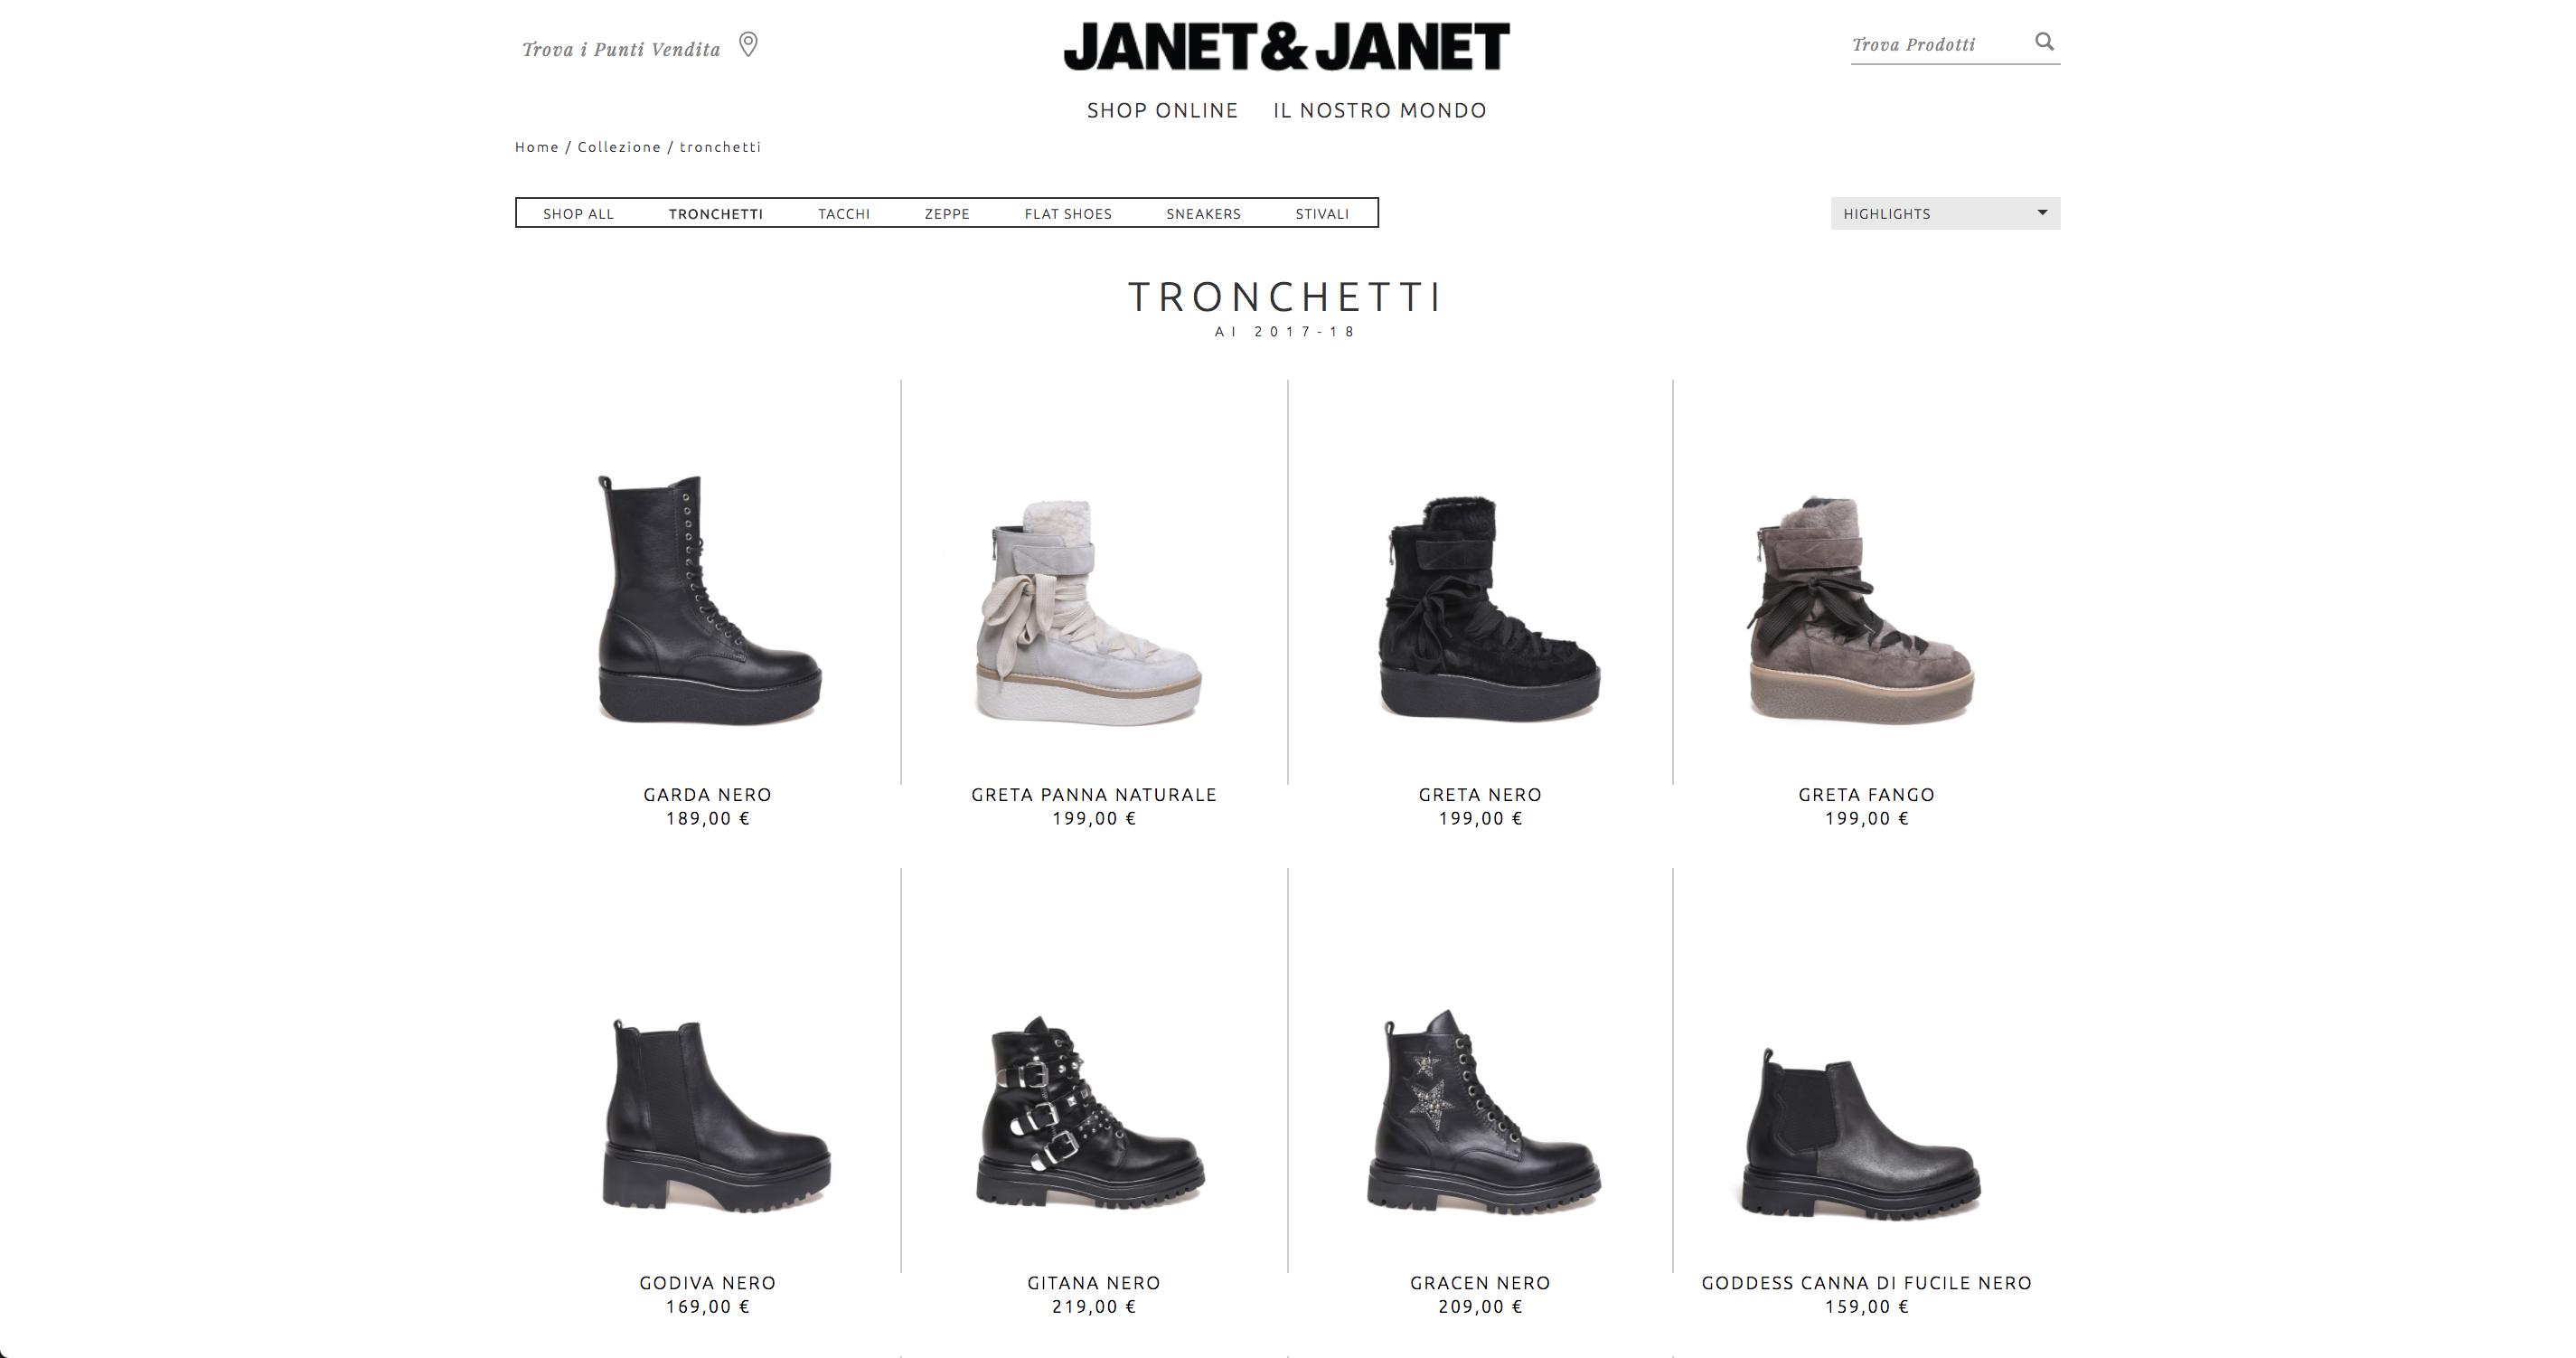 Janet & Janet shop online